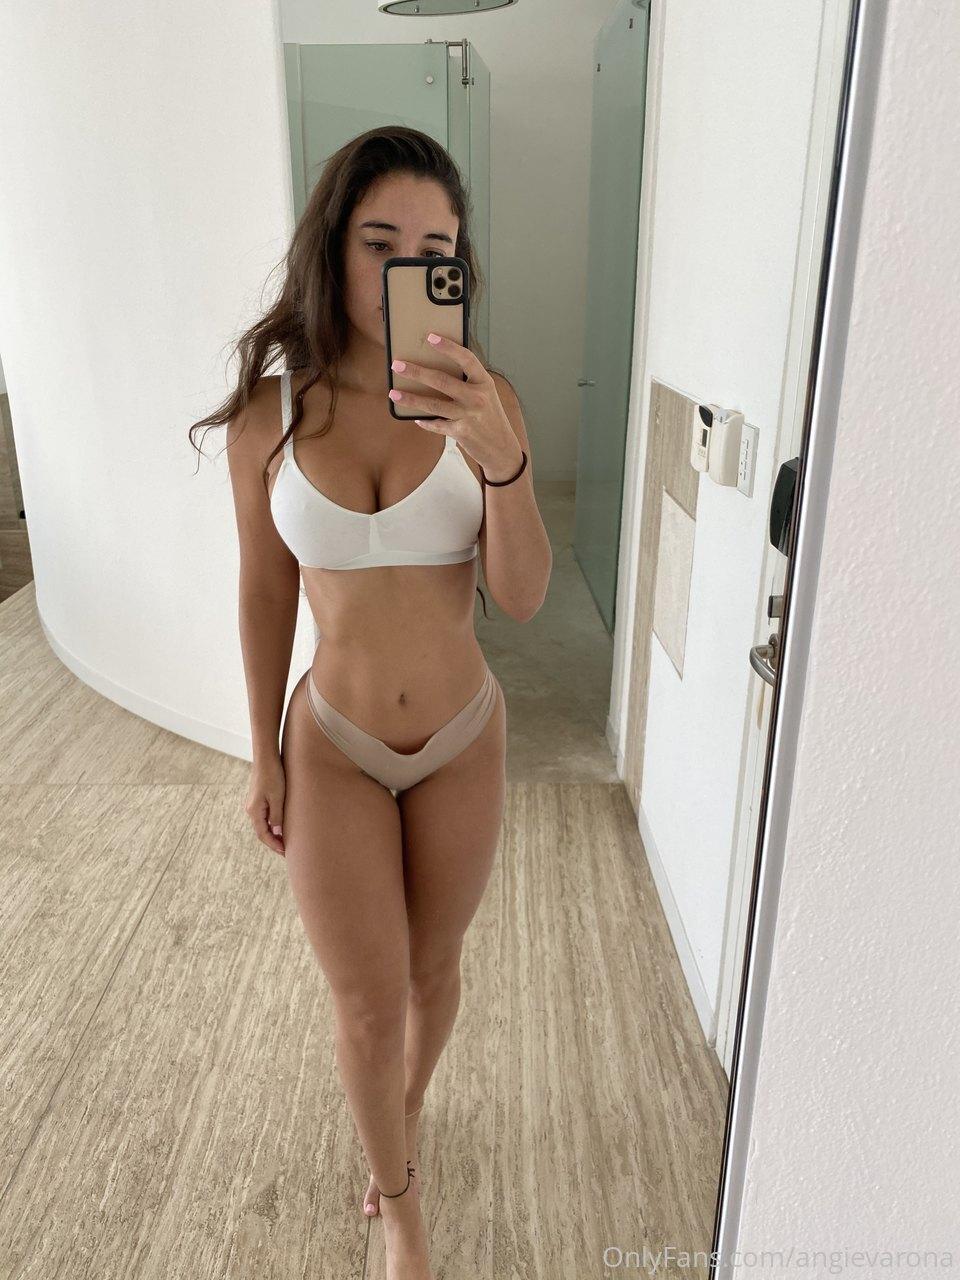 Angie Varona Onlyfans 0174